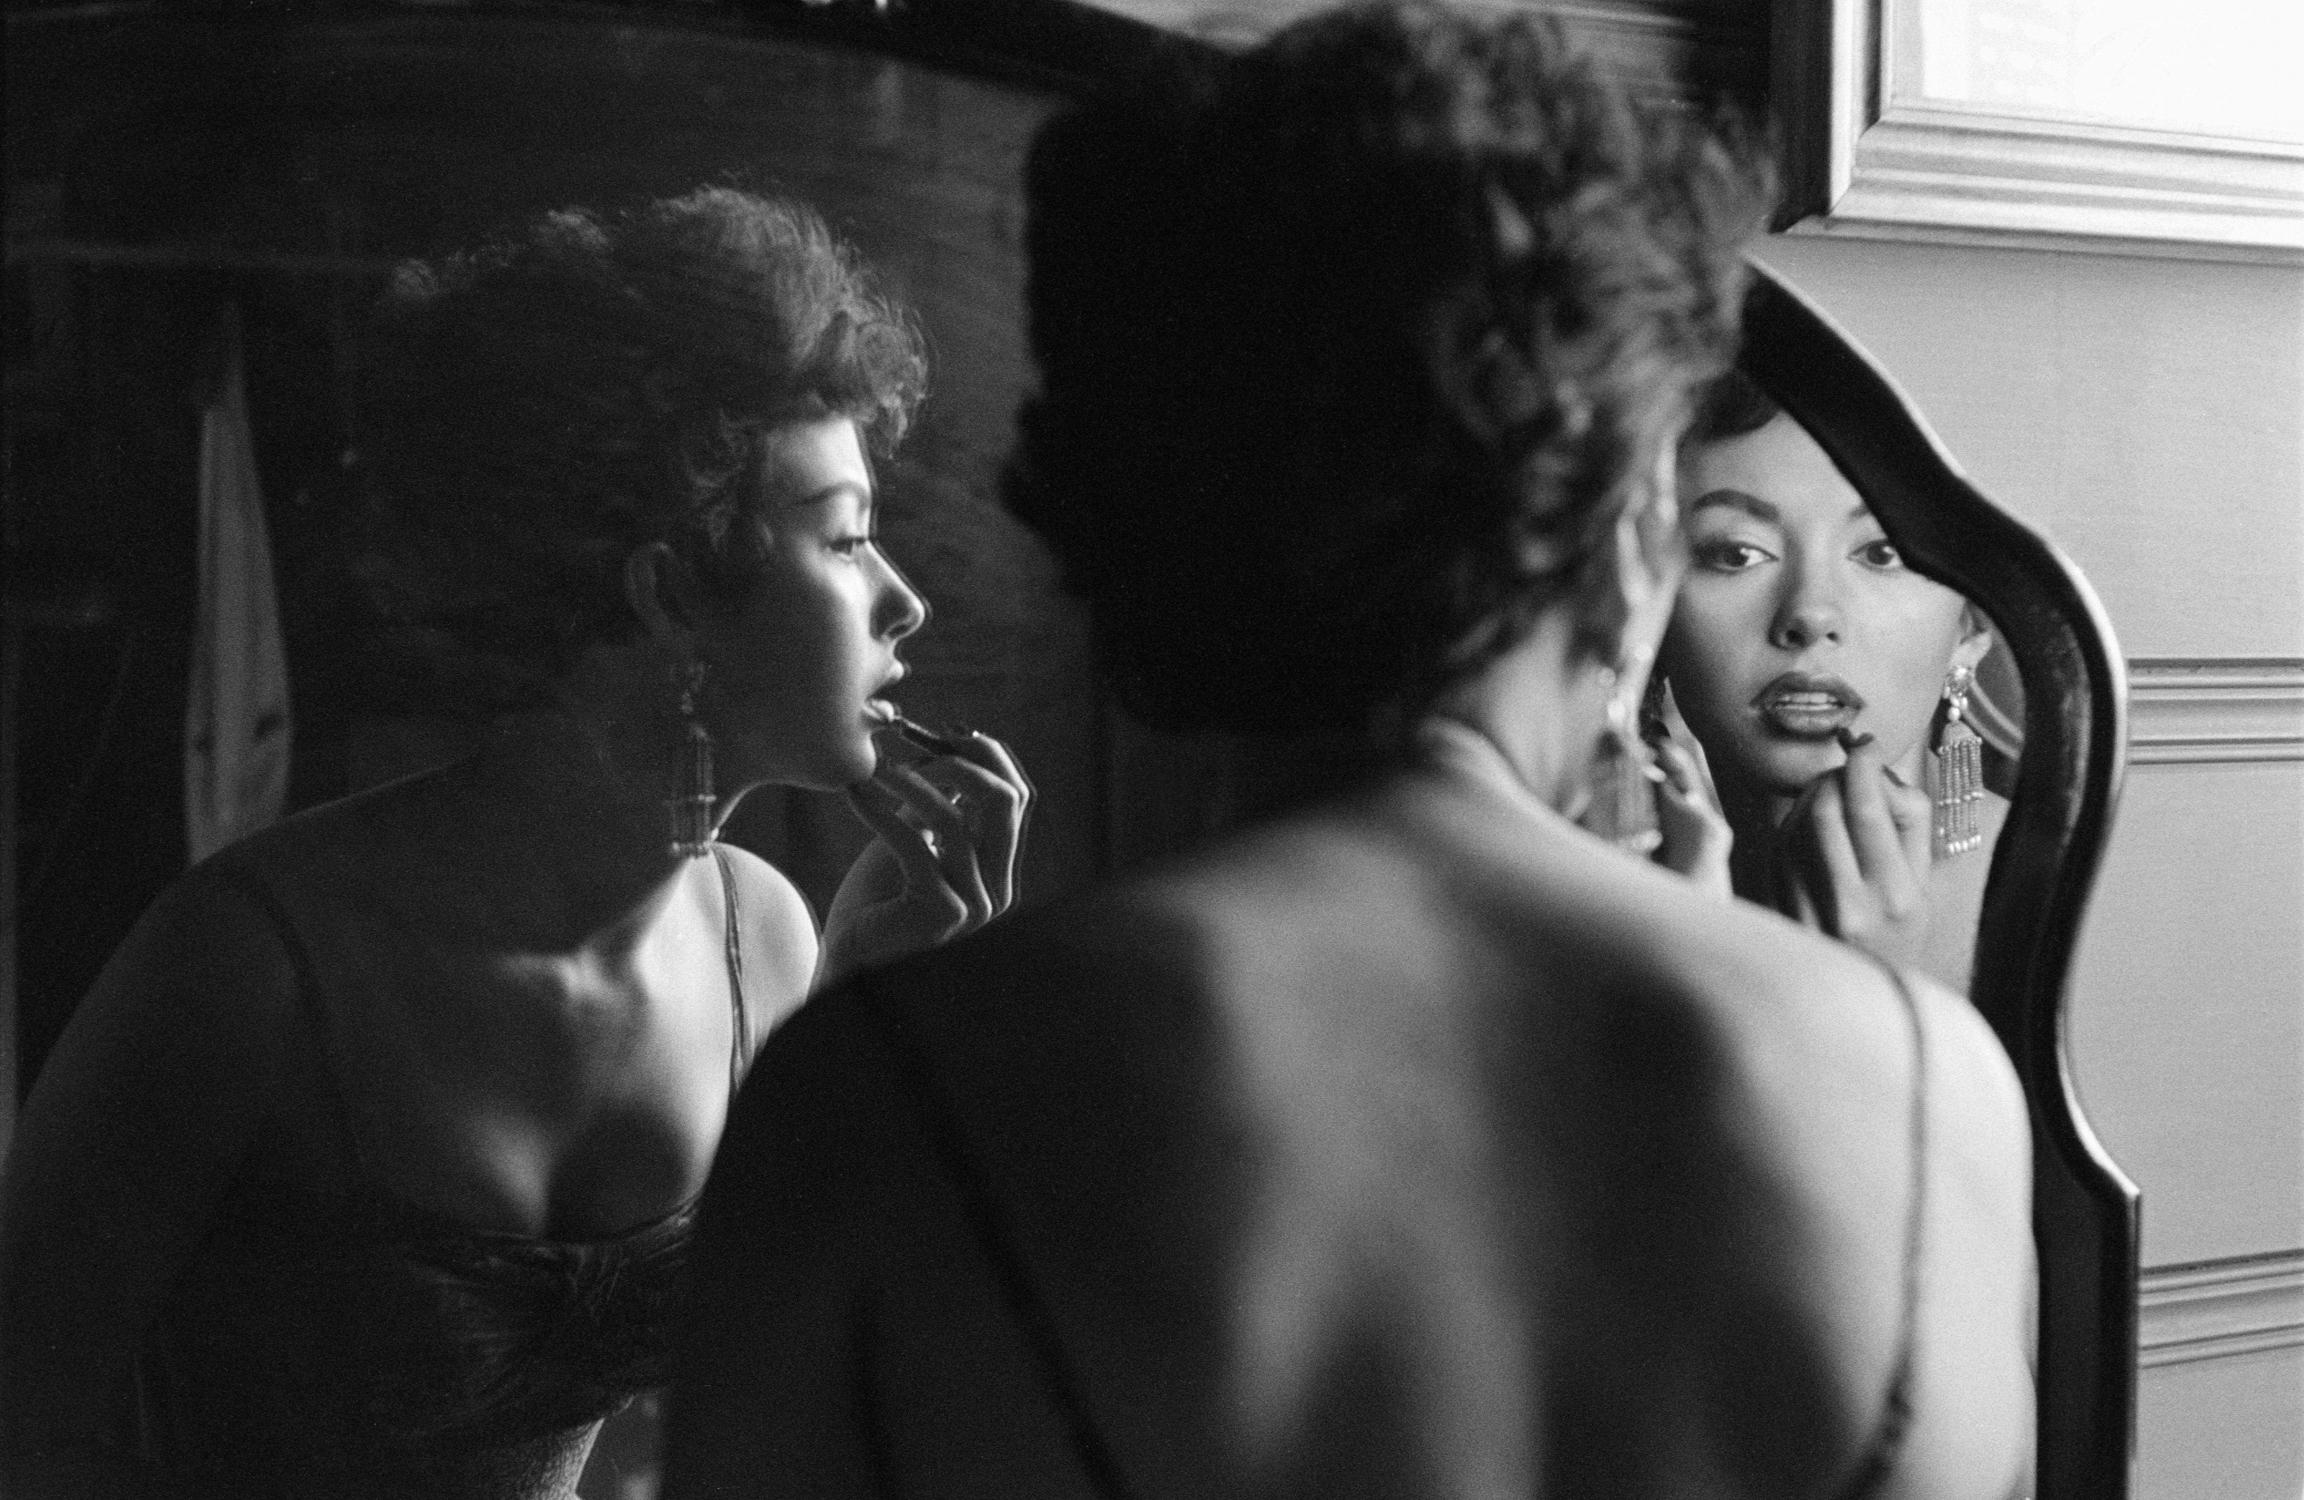 Rita Moreno Putting On Lipstick In Mirror, 1954